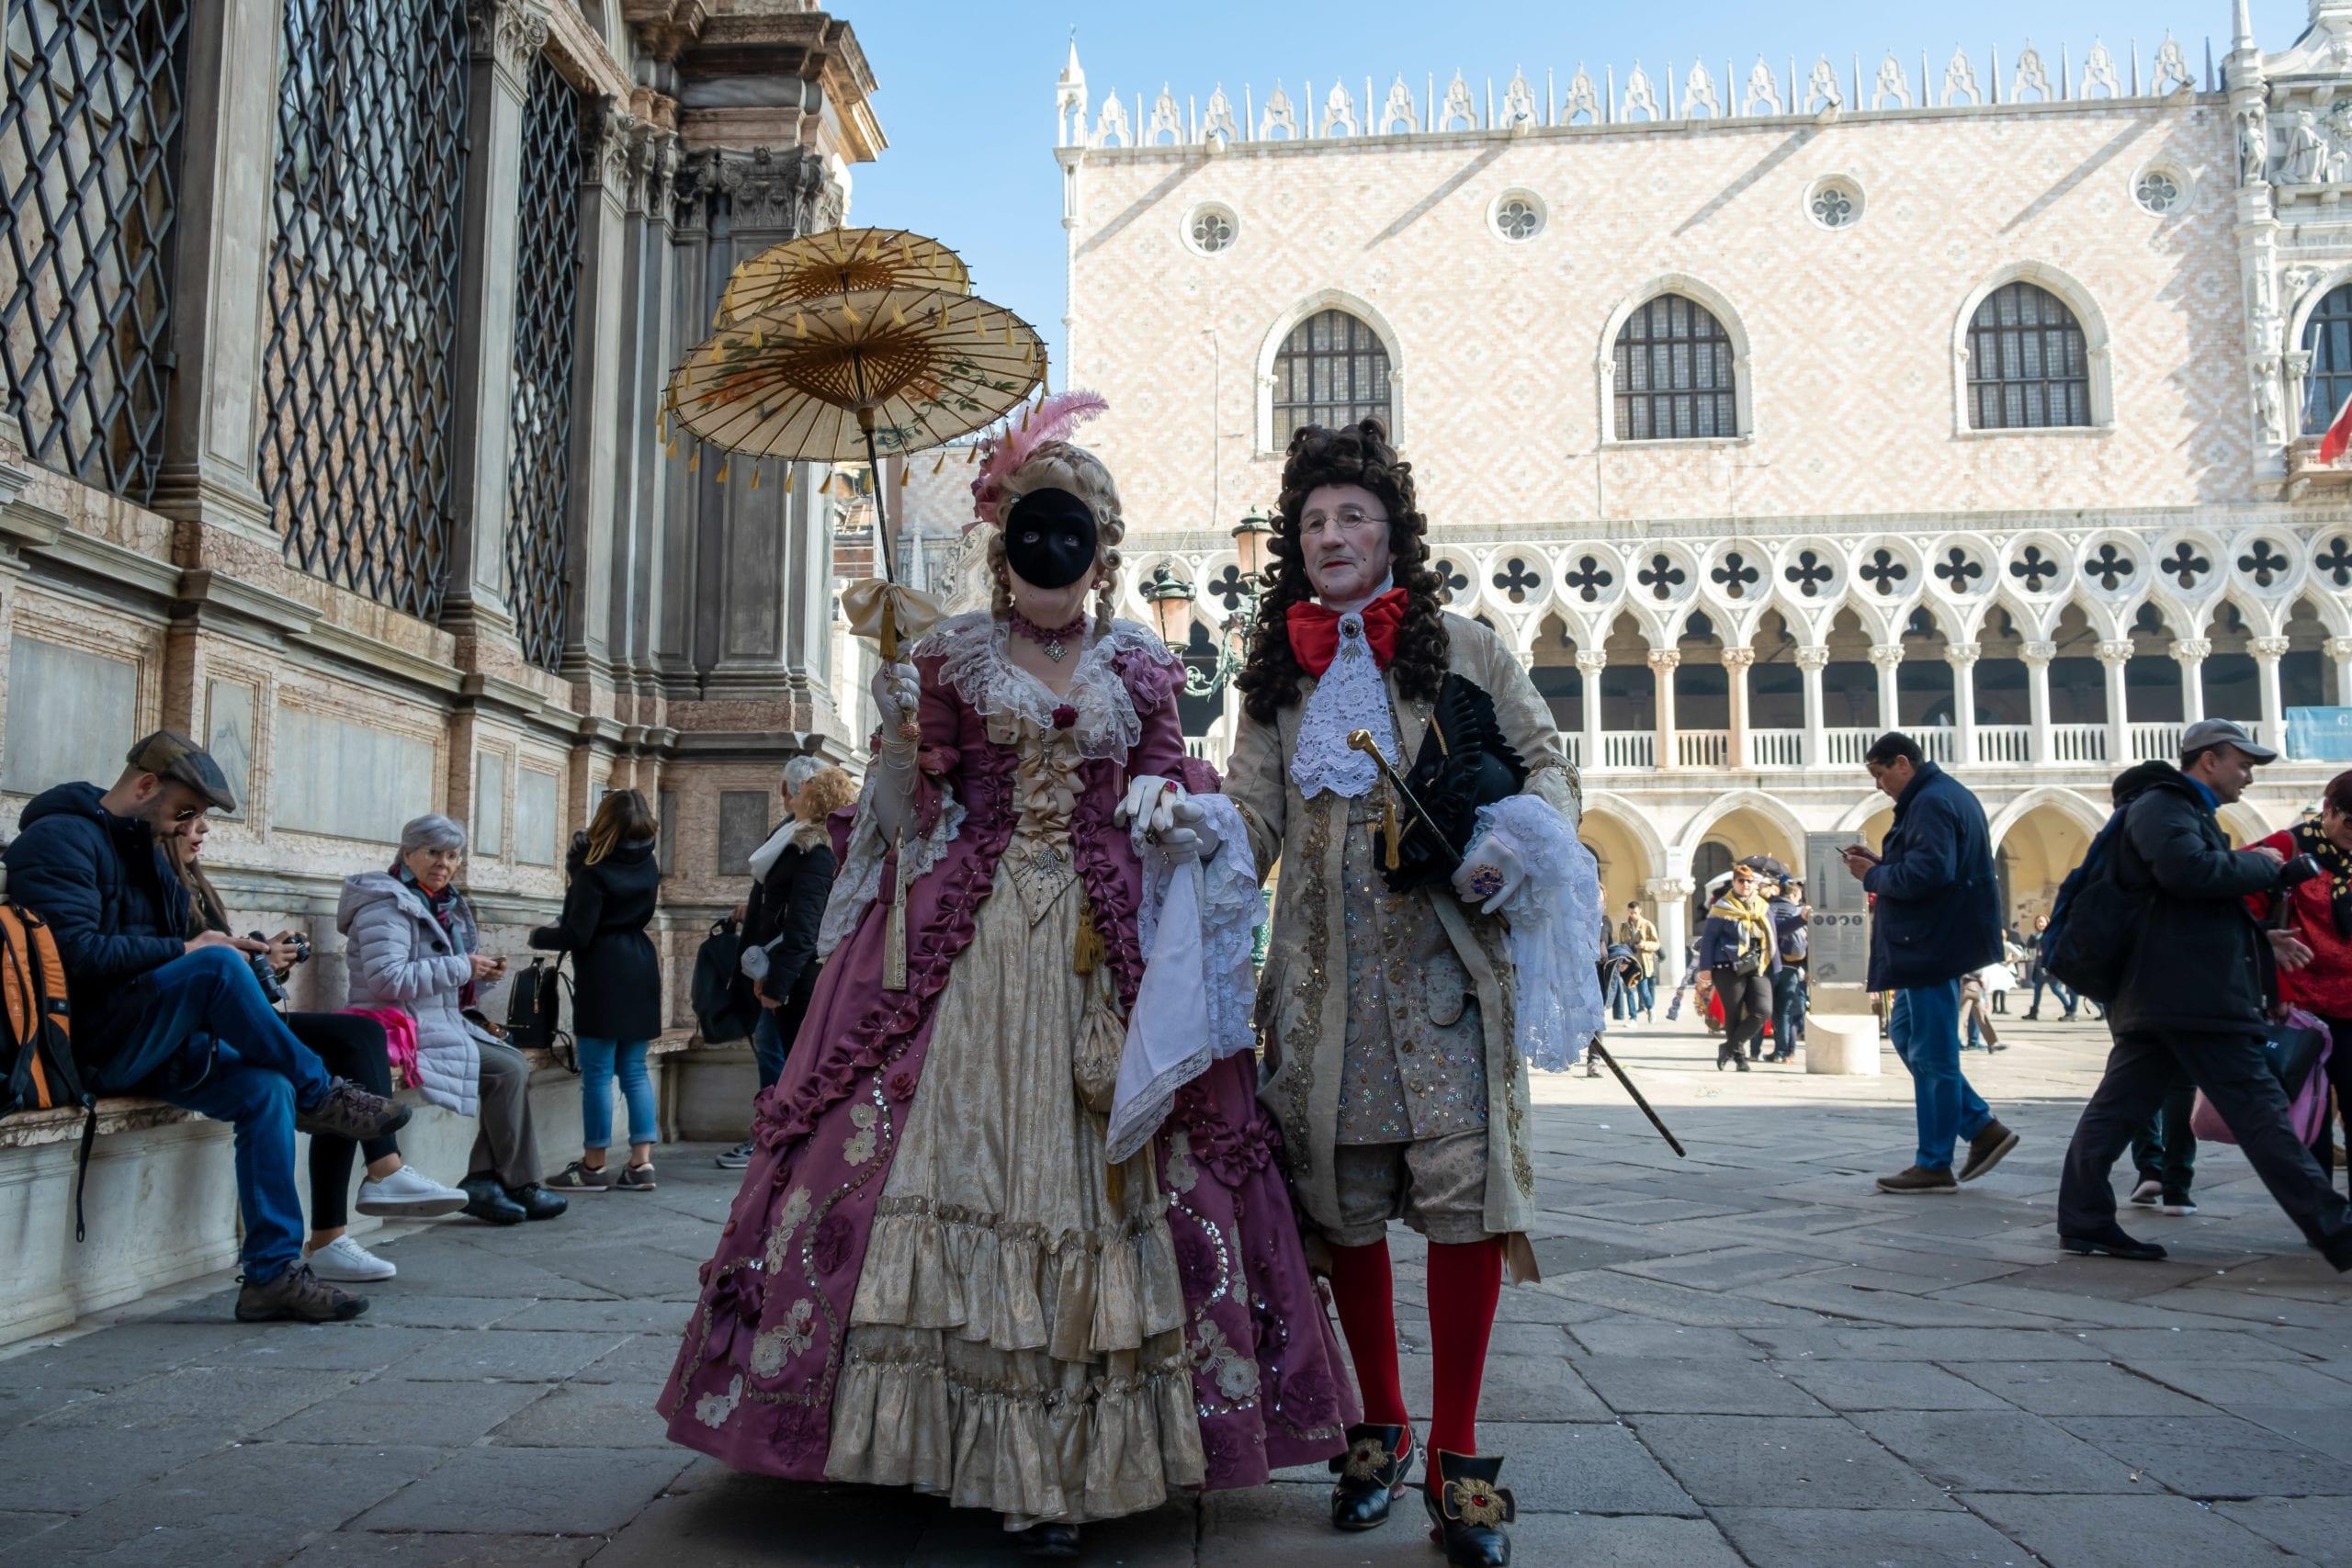 Venetians celebrate carnival - Venice Carnival. Venice, Italy - 27 February 2019. Les vénitiens fêtent le carnaval - Carnaval de Venise. Venise, Italie - 27 février 2019.